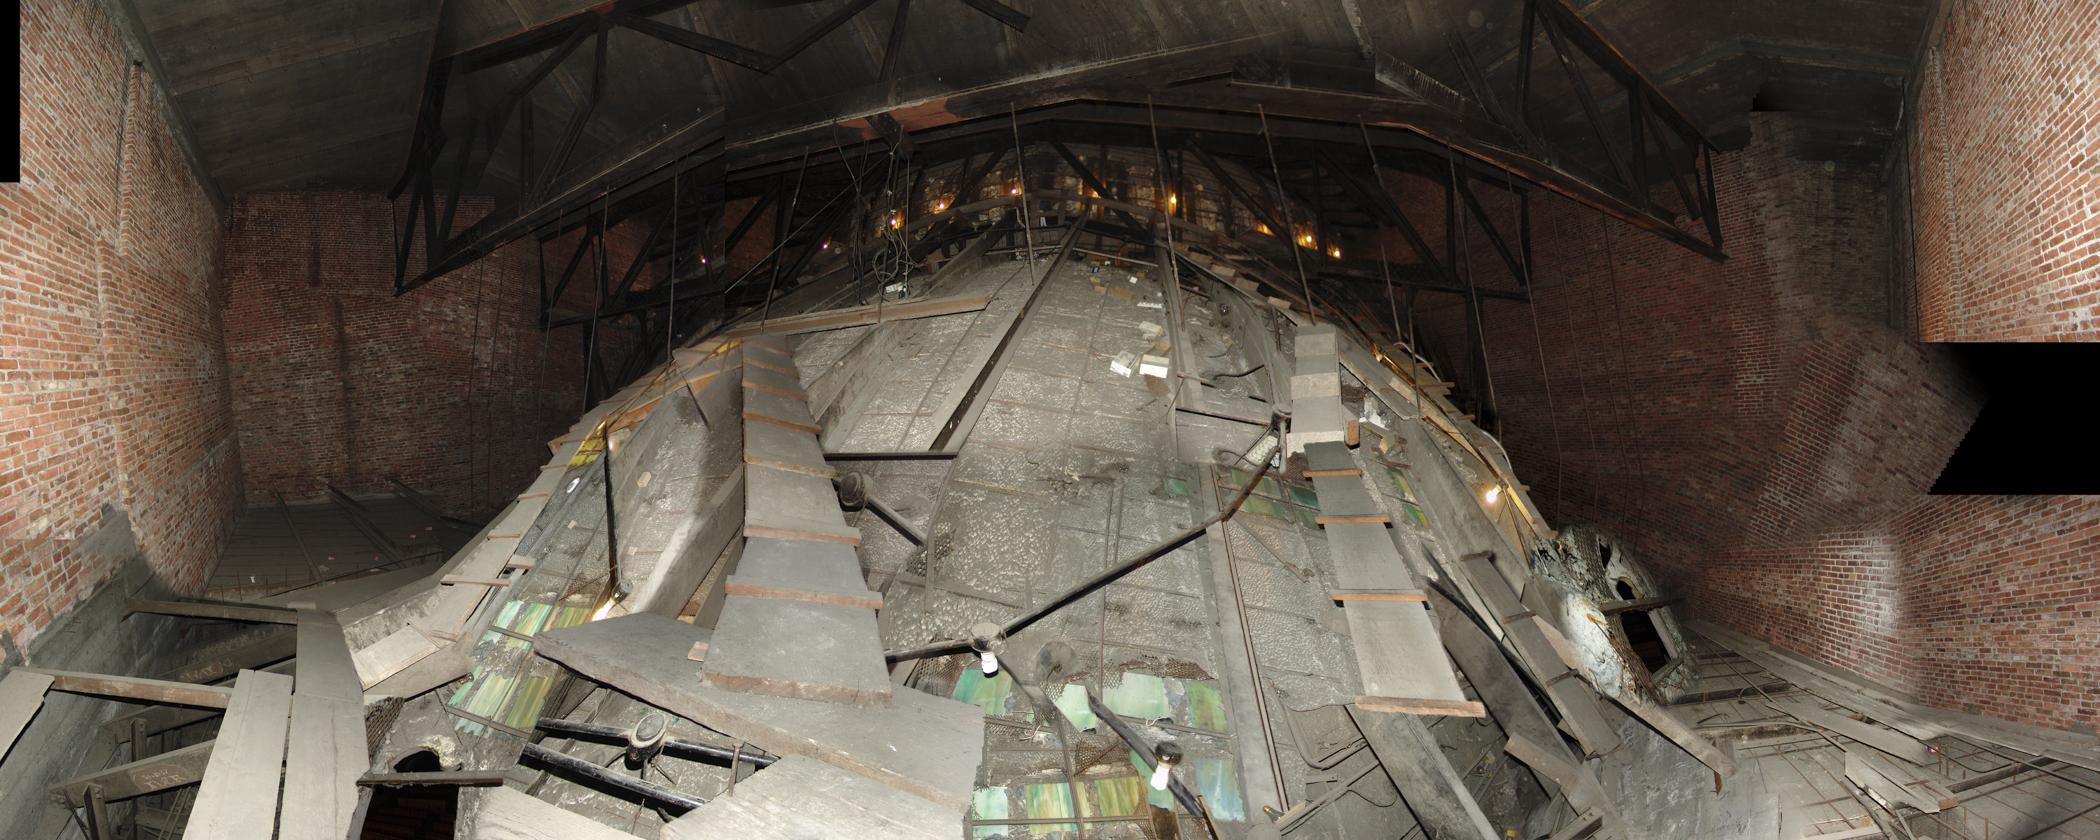 Inside The Moore Theatre Dome